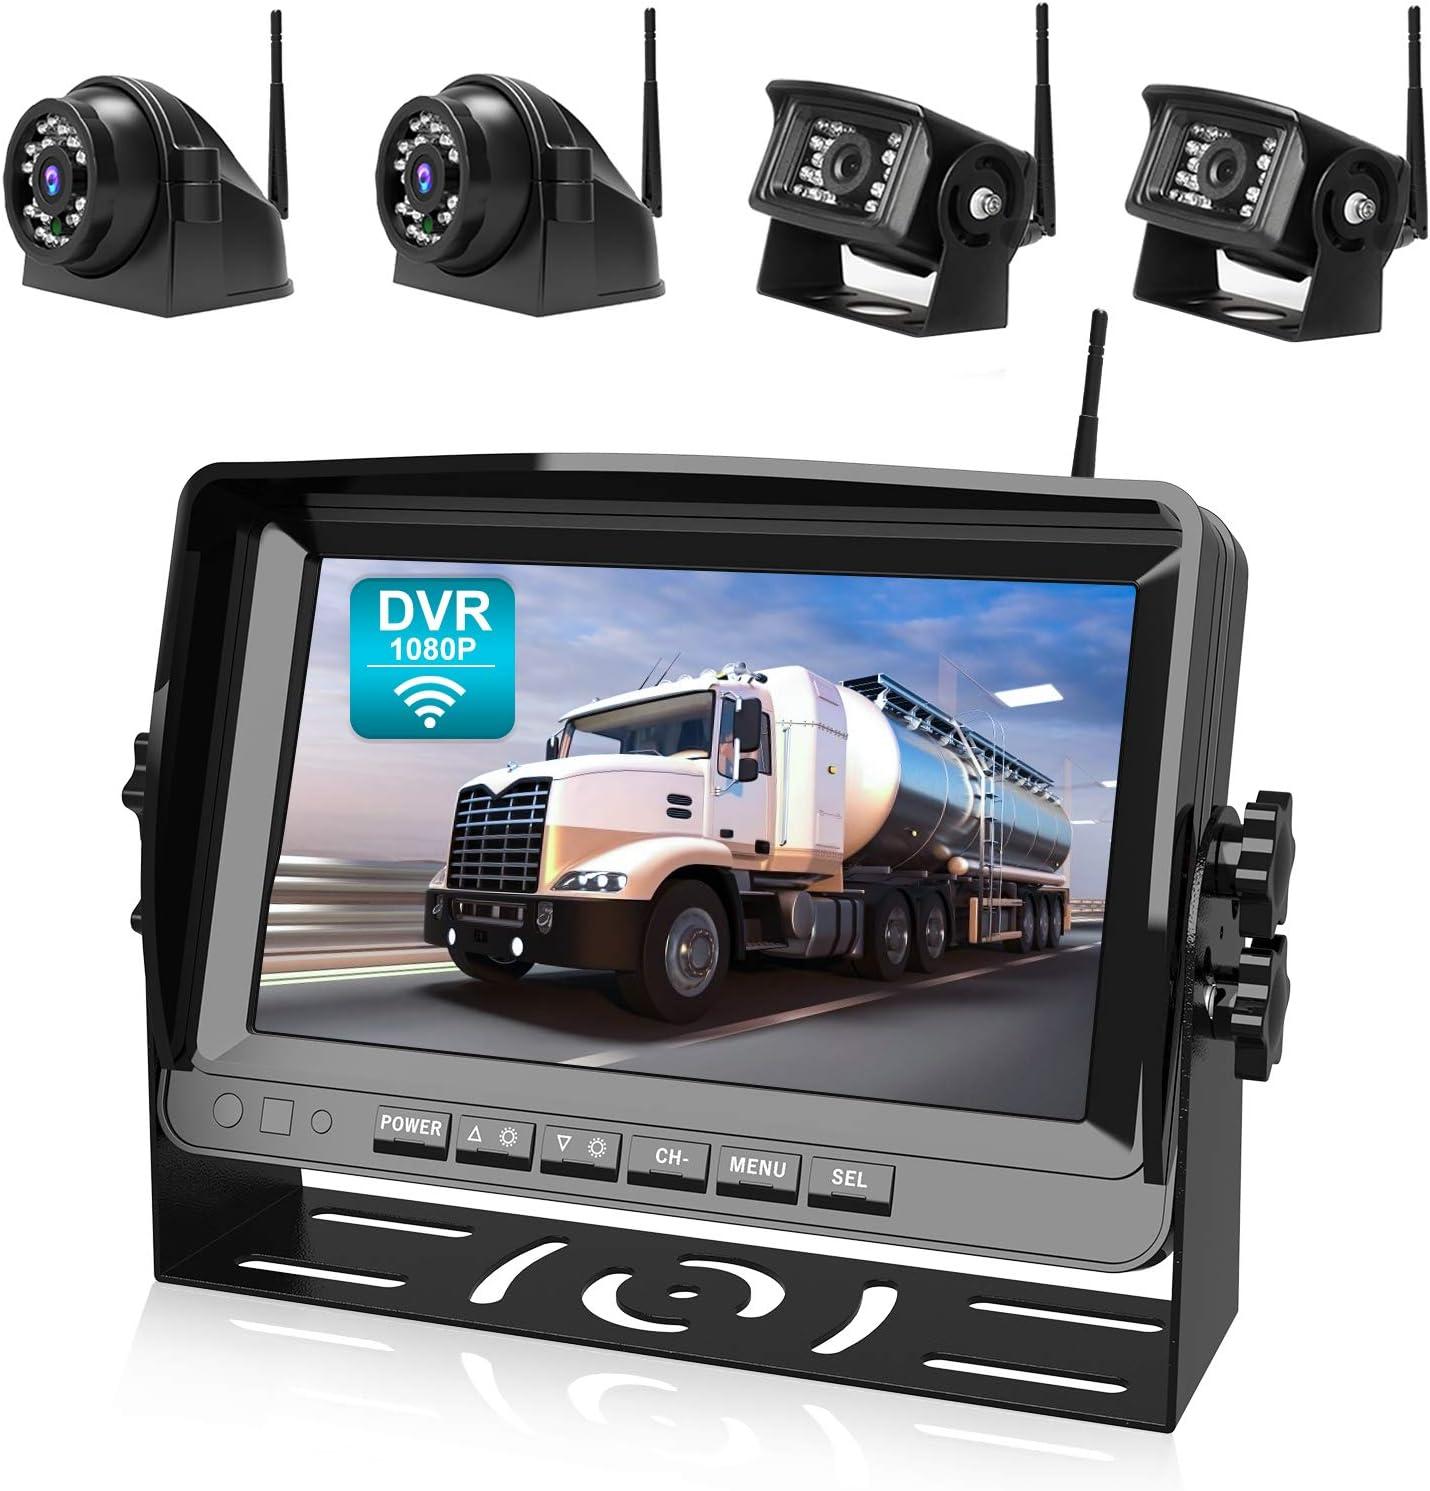 Fookoo HD 1080P Wireless Backup Camera System, 9